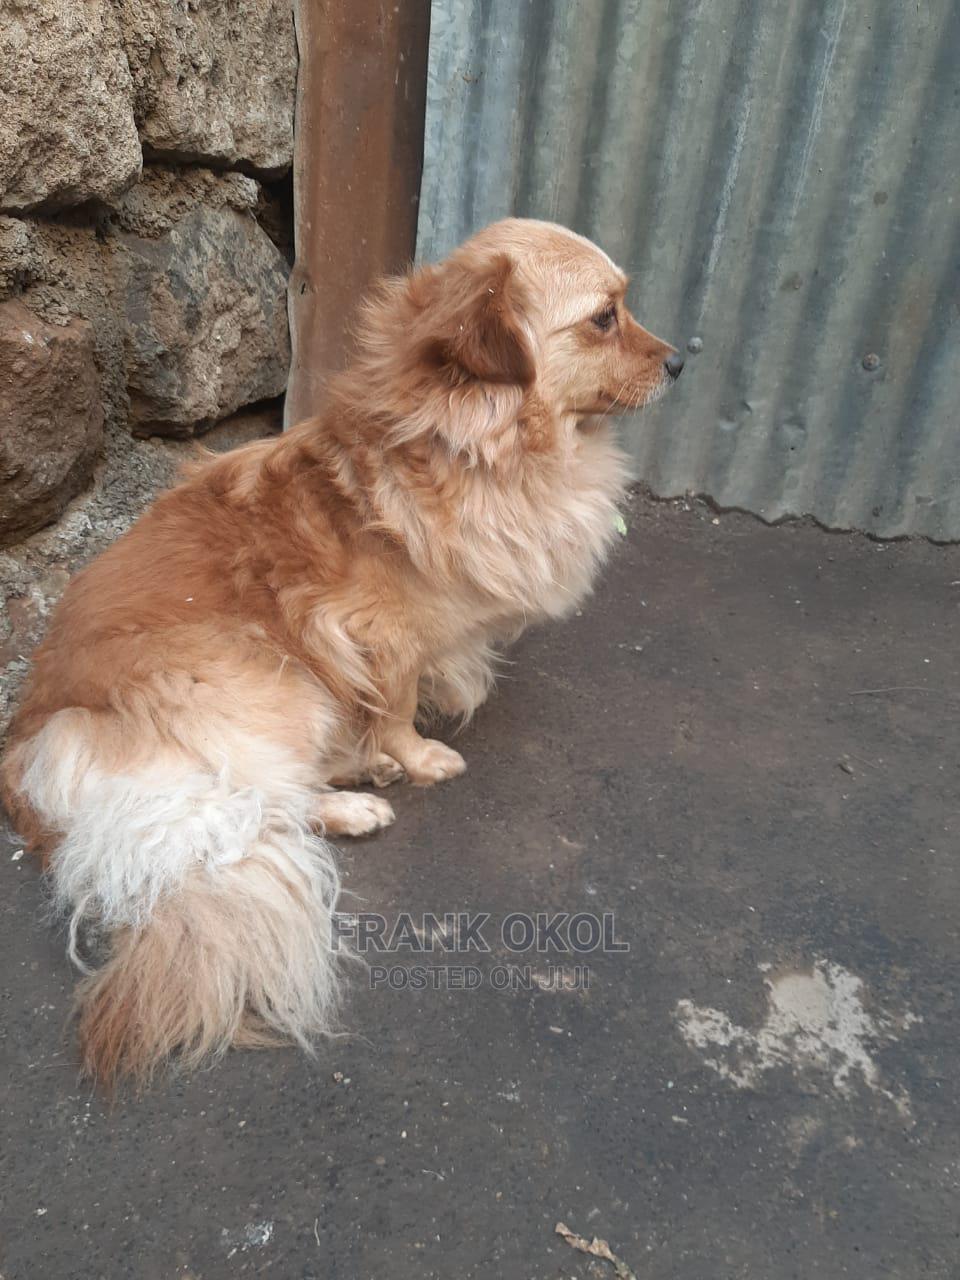 6-12 month Male Mixed Breed Japanese Spitz | Dogs & Puppies for sale in Utawala, Nairobi, Kenya